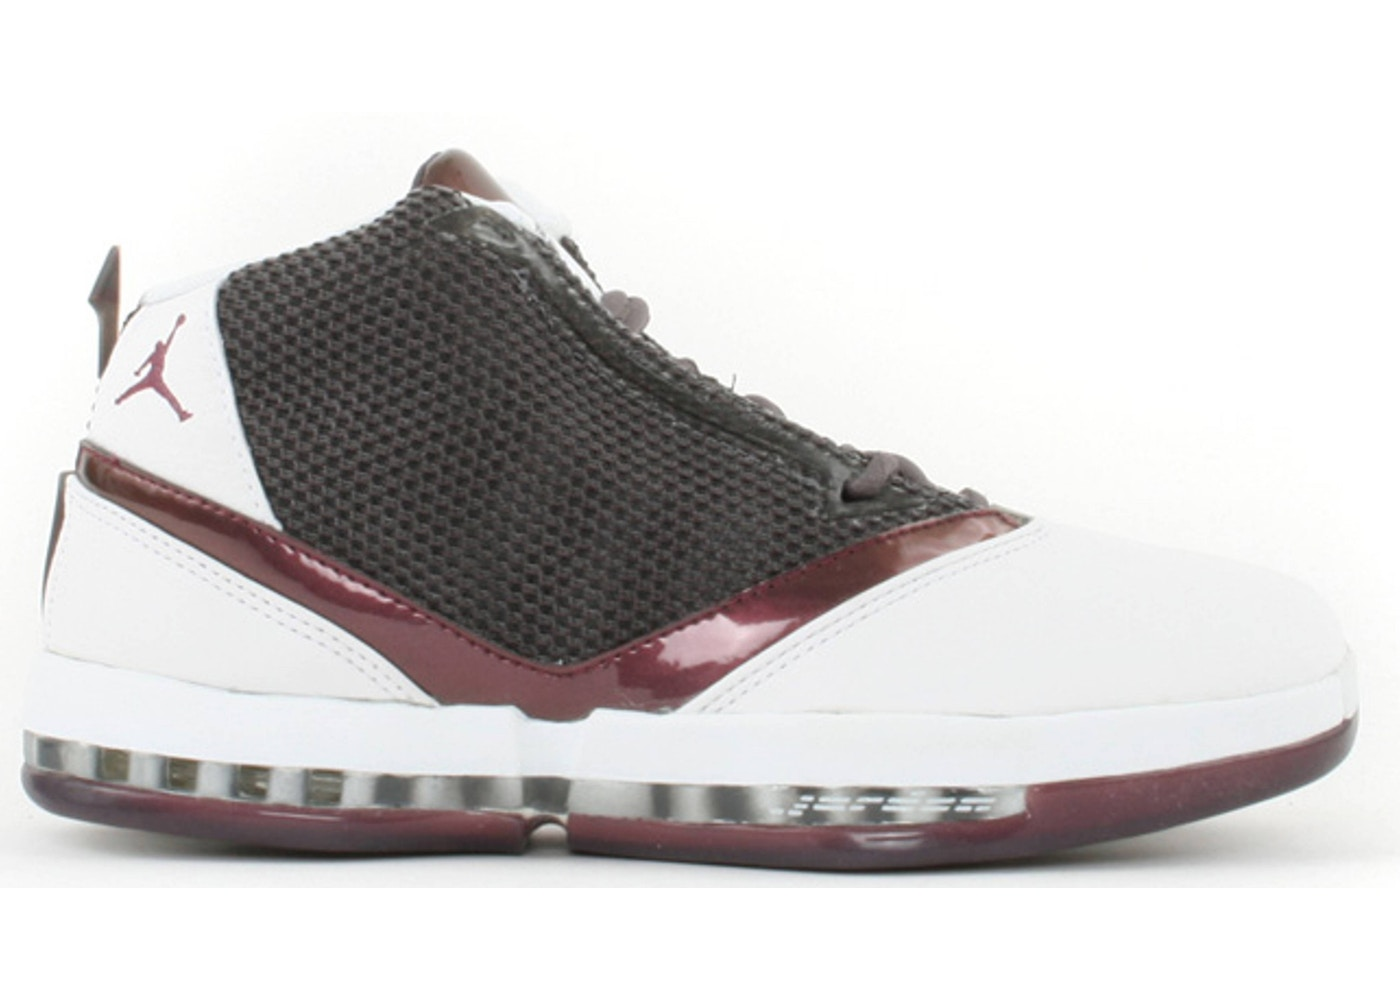 separation shoes d1eca 6324c Jordan 16 OG Cherrywood - 136080-020